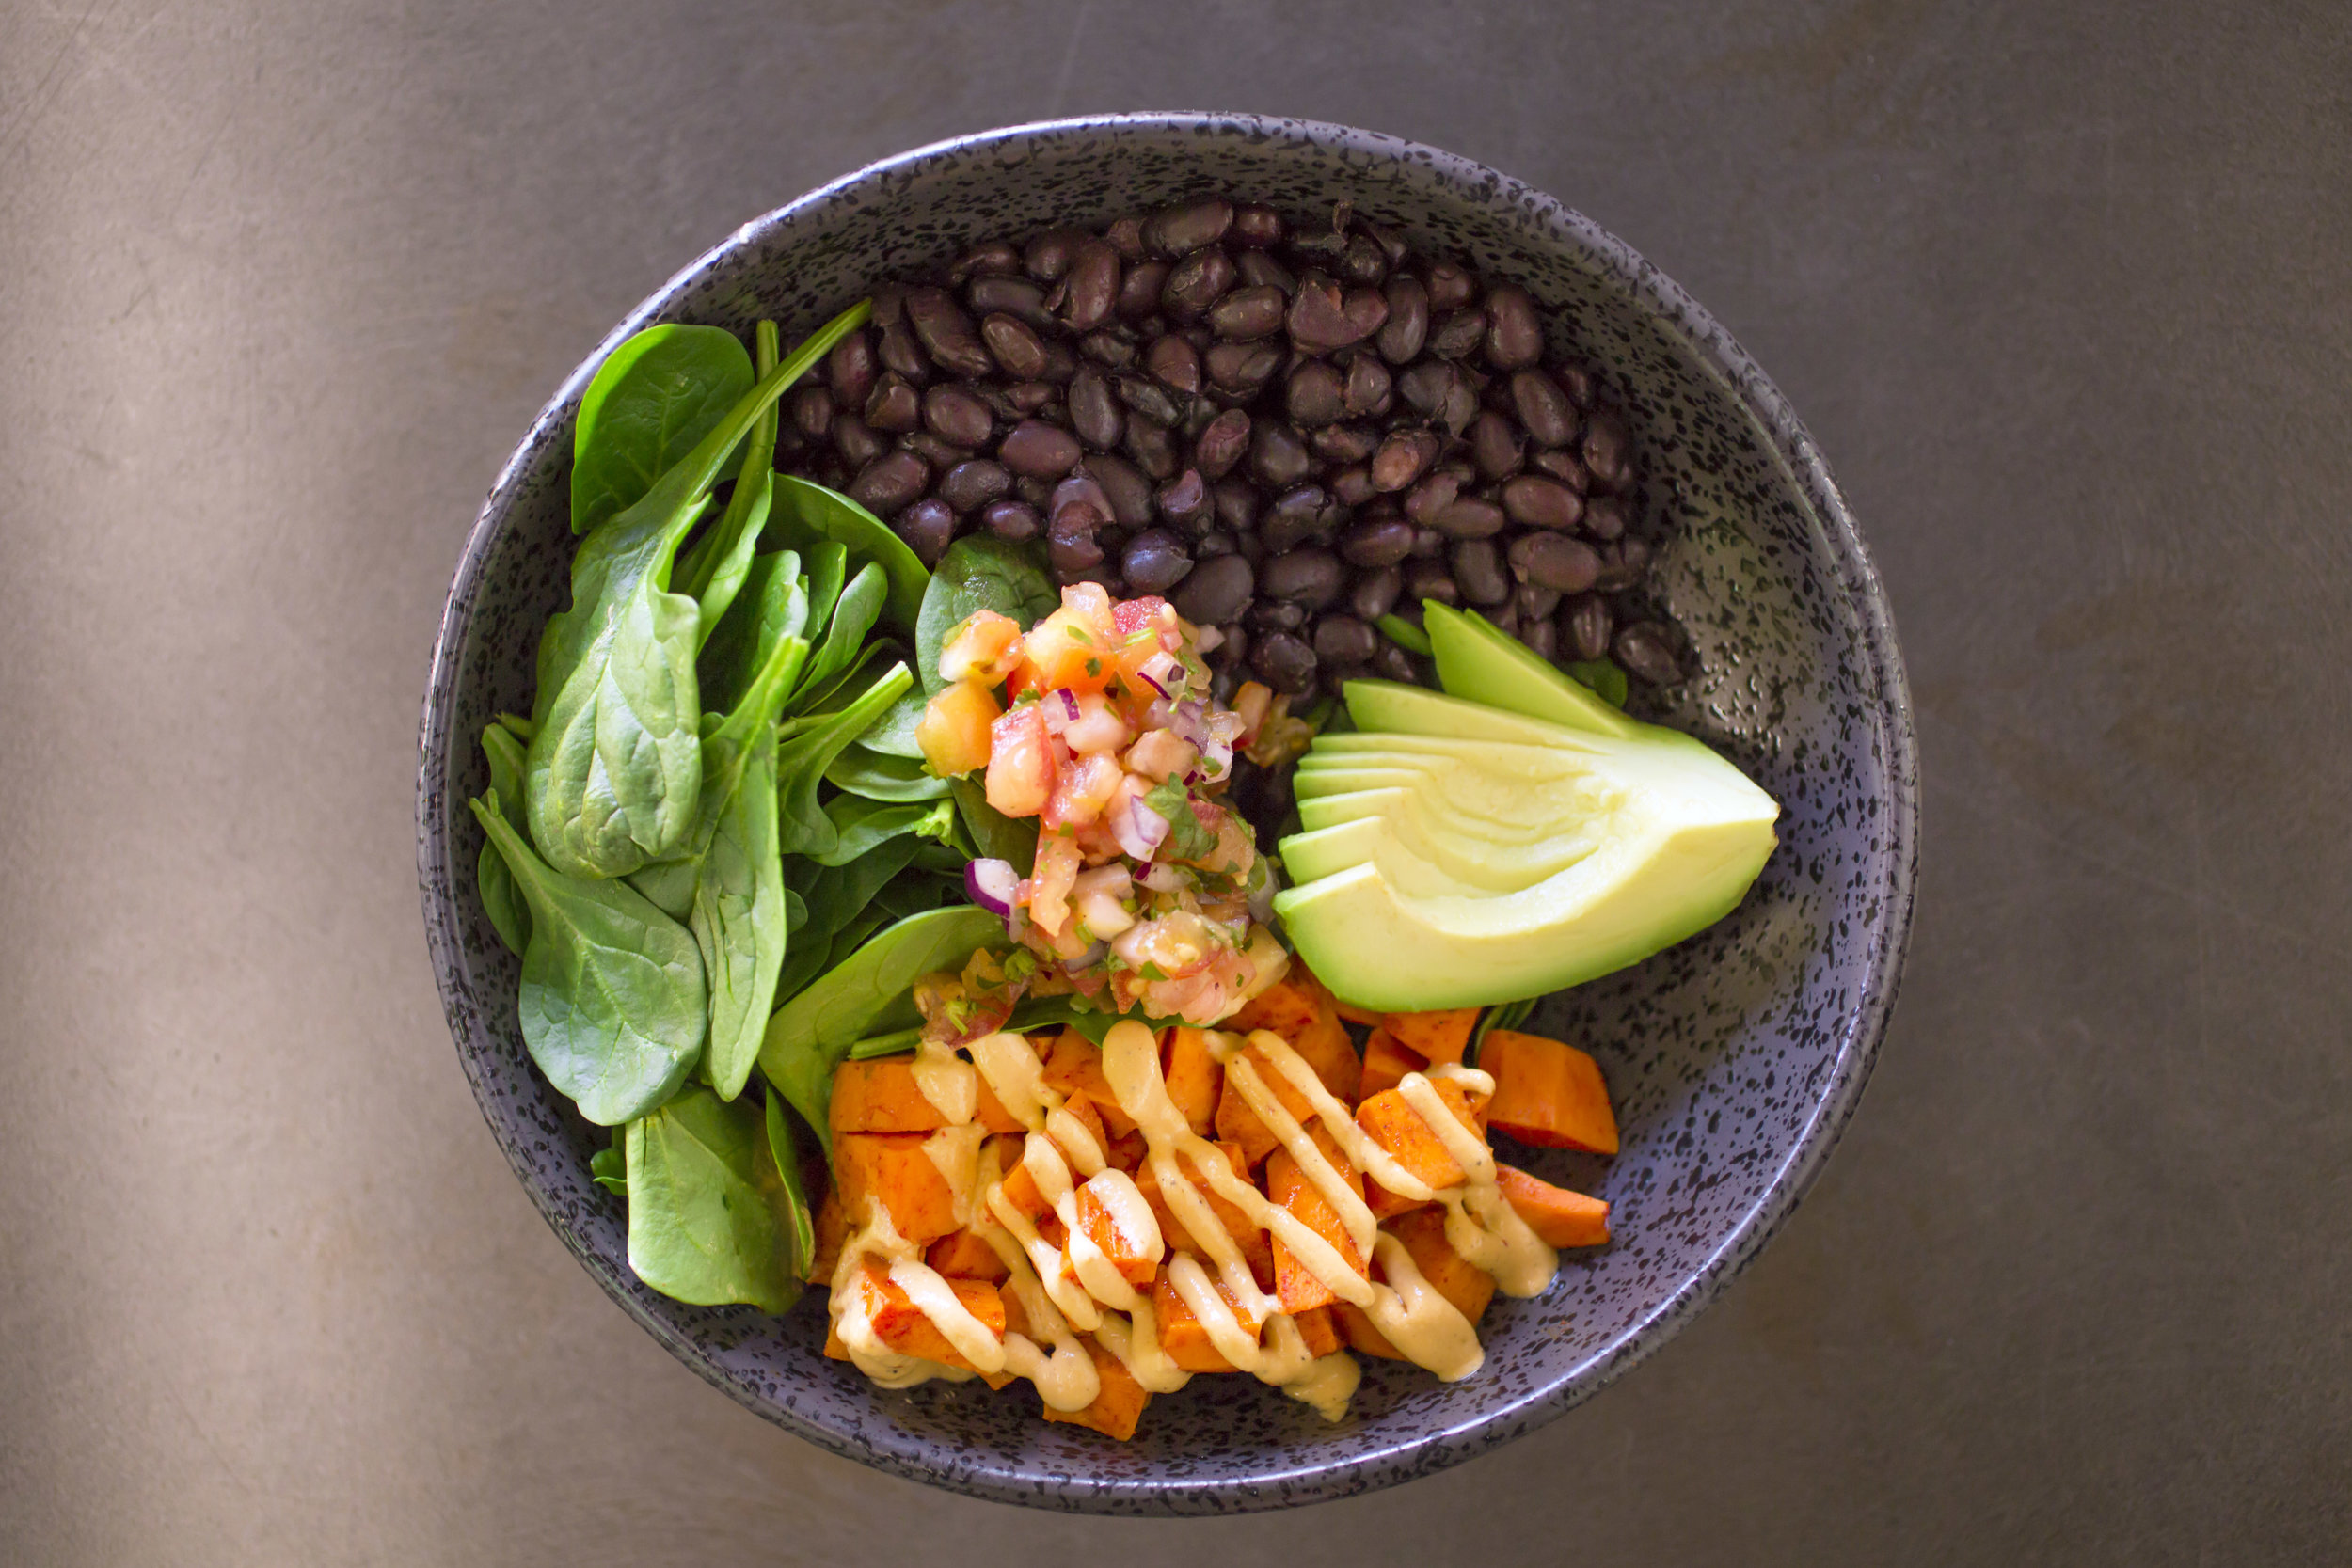 11 Vegan Bowl.jpg